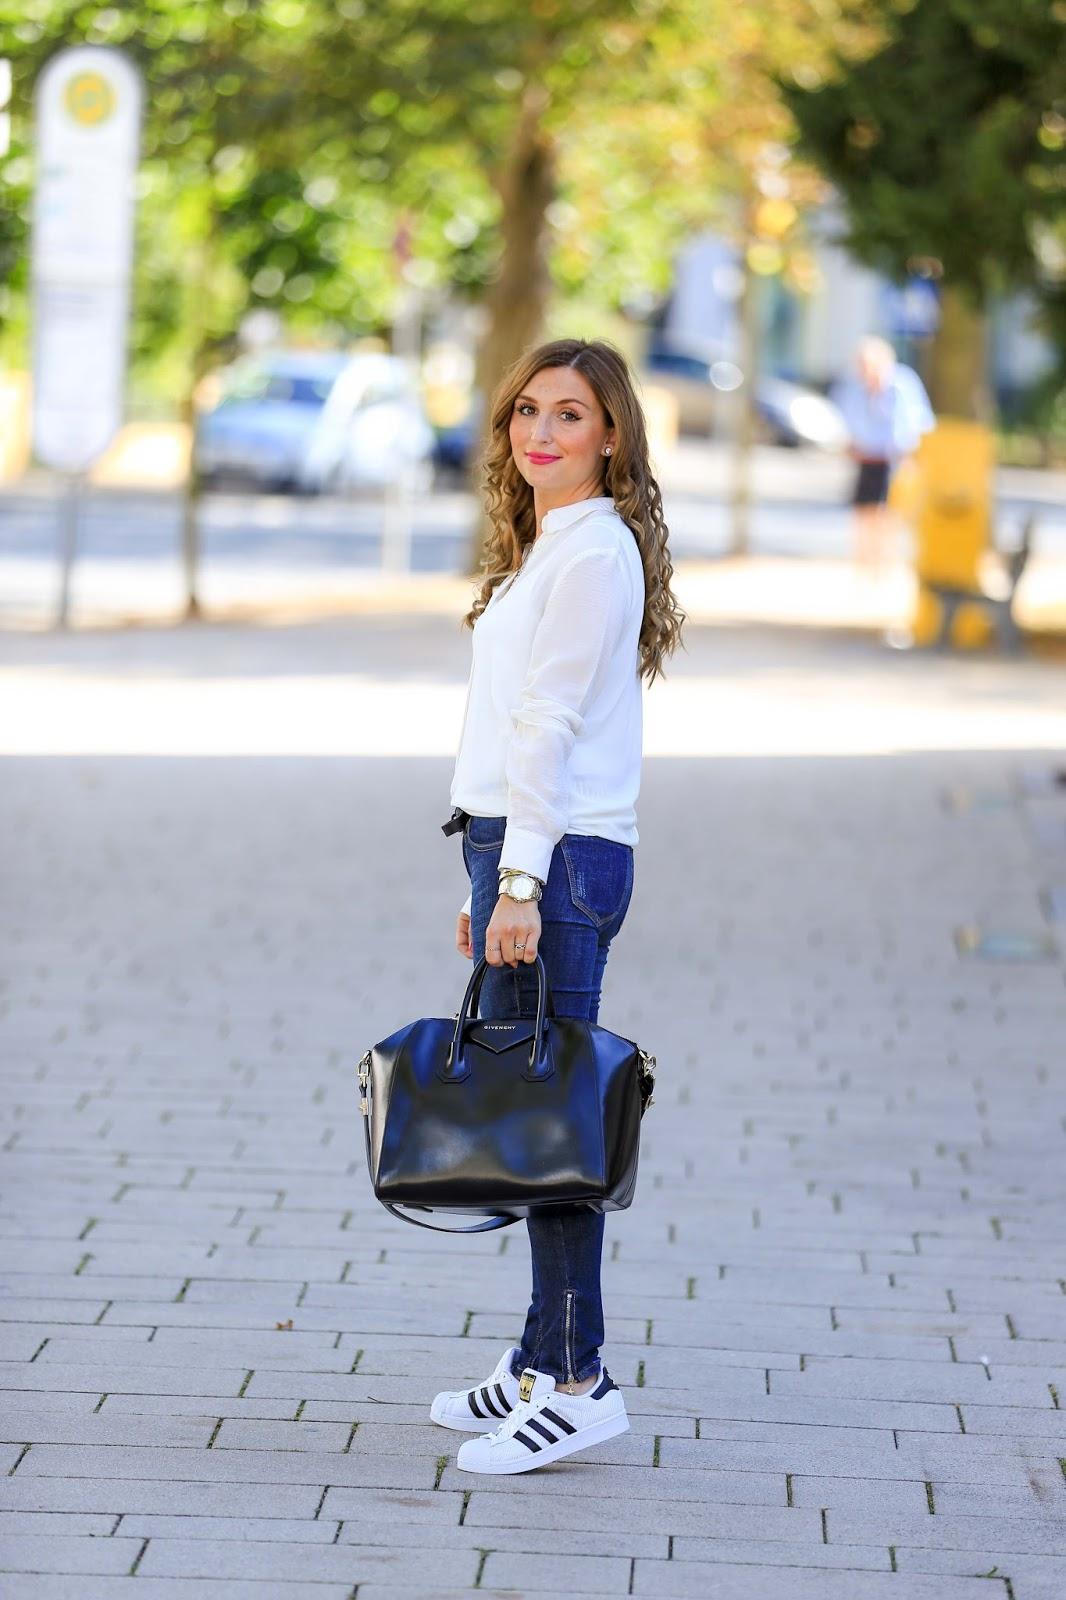 Fashionstylebyjohanna-Blogger-Fashionblog-Outfit-Modeblog-München-deutsche-Fashionblogger-Influencer-rosa-GivenchytascheiPhone